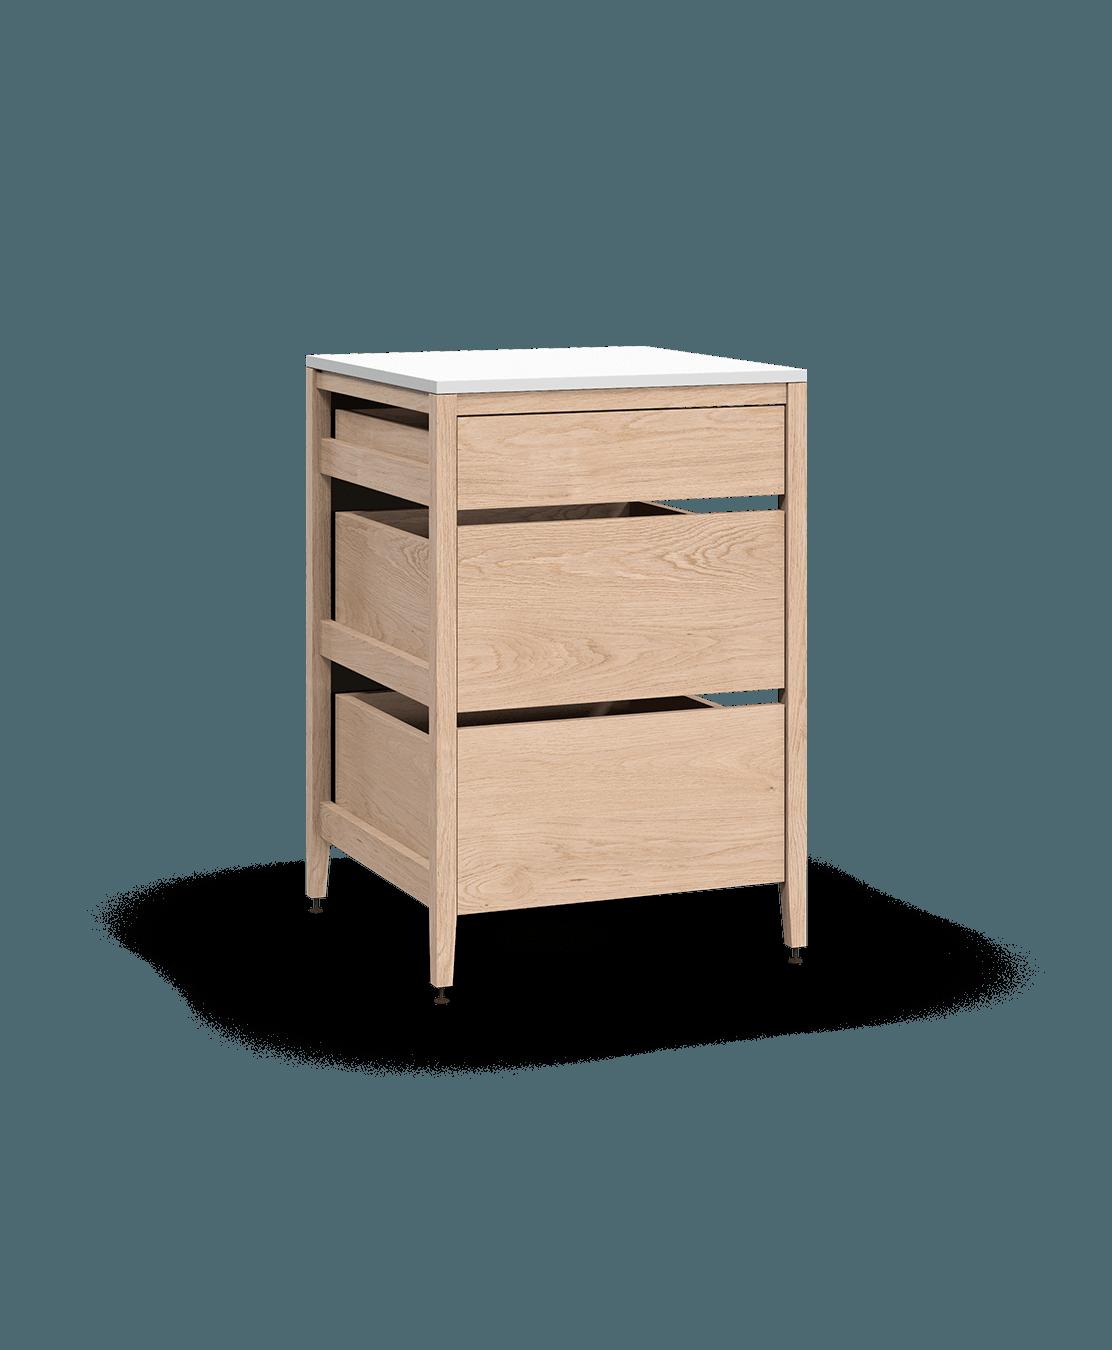 coquo radix white oak solid wood modular 3 drawers base kitchen cabinet 27 inch C1-C-27TB-3001-NA